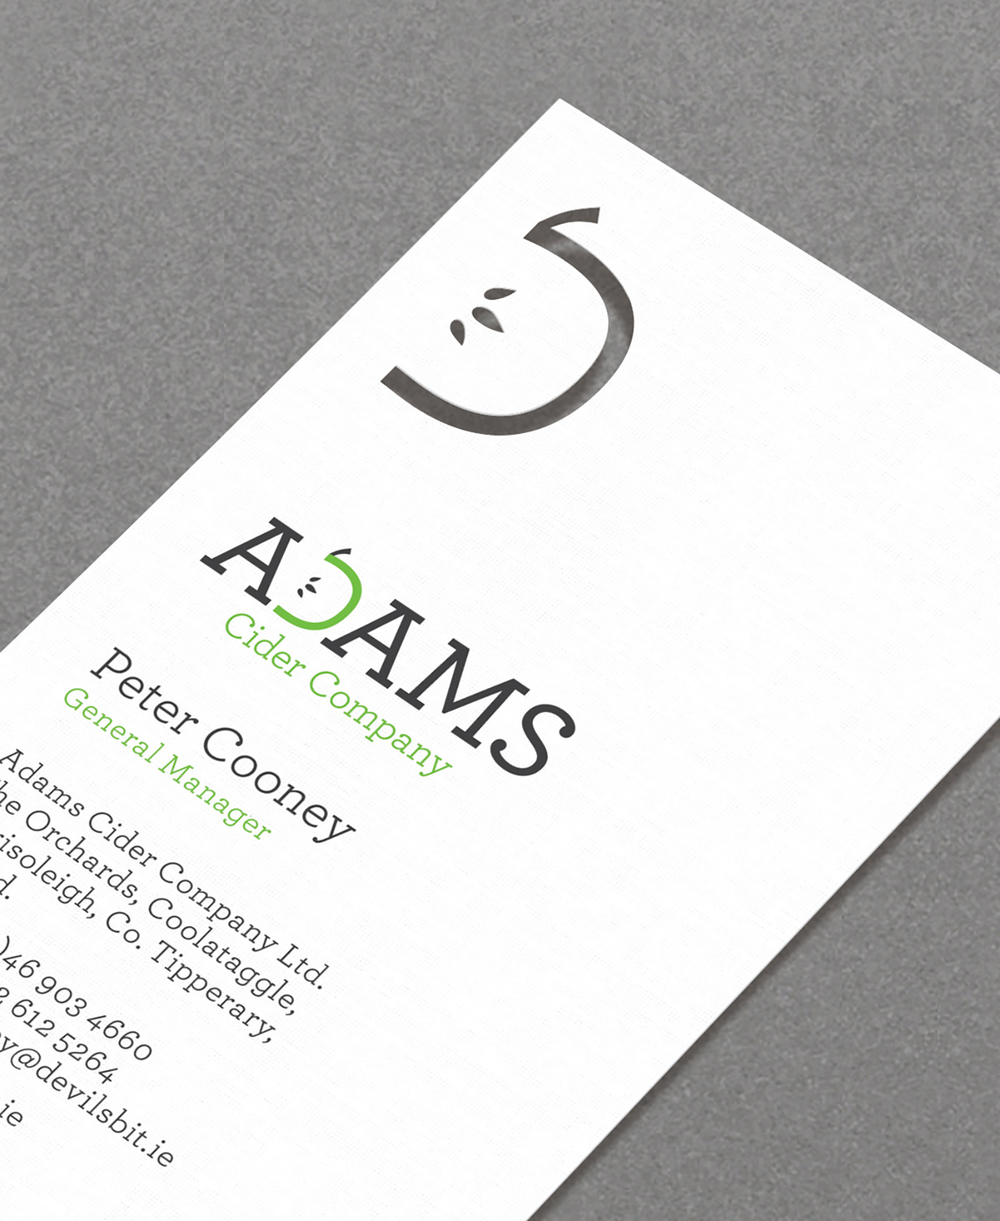 Adams+2.jpg